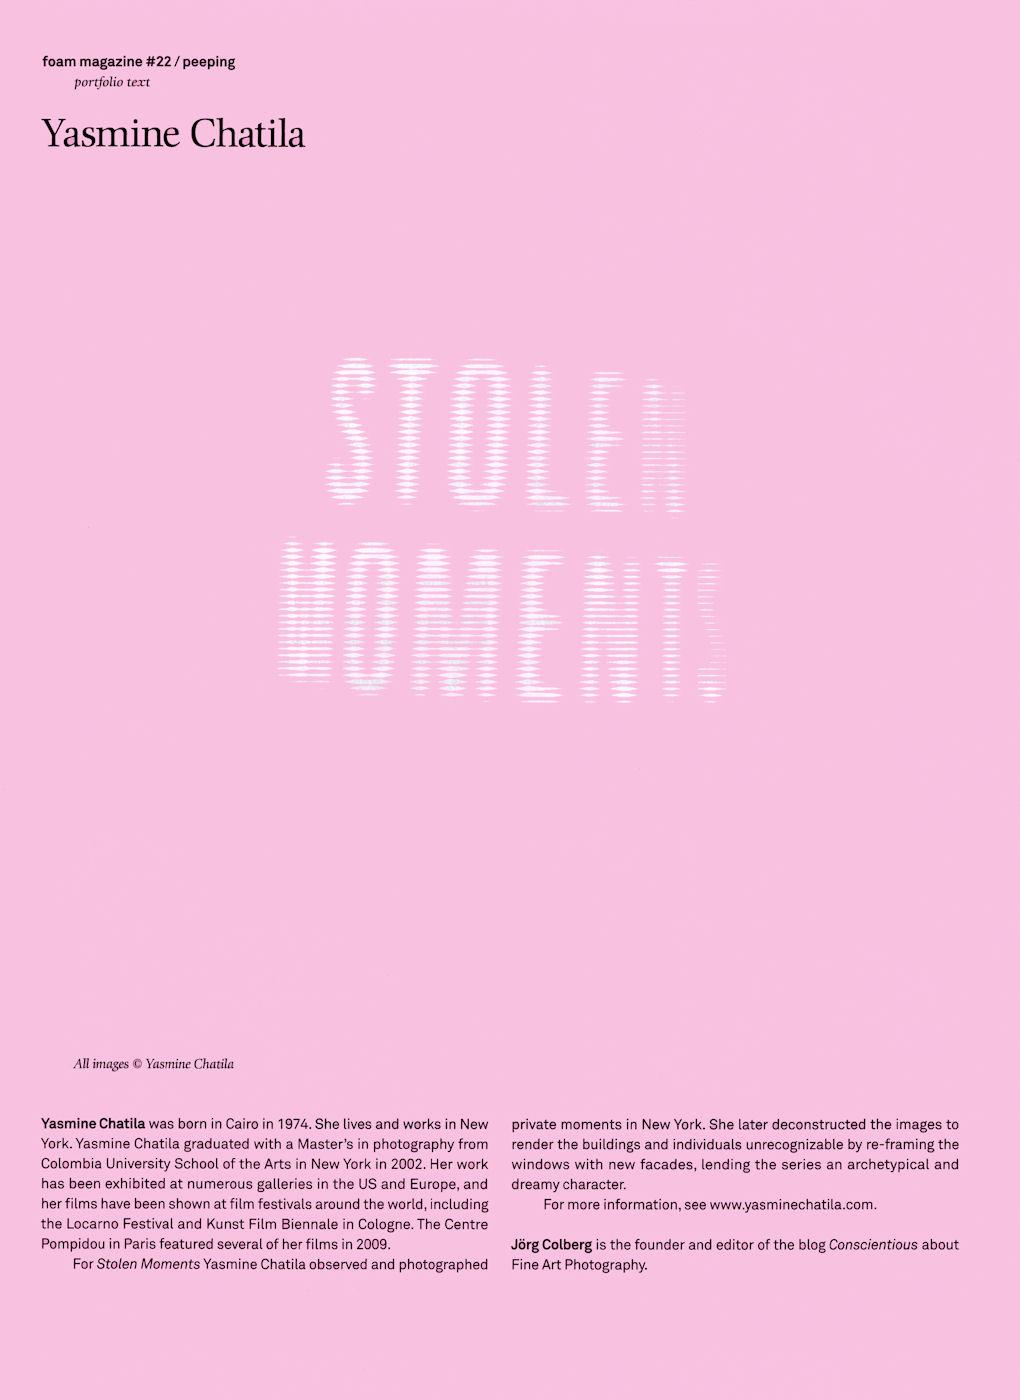 foam-magazine-spring-2010-page-001.jpg